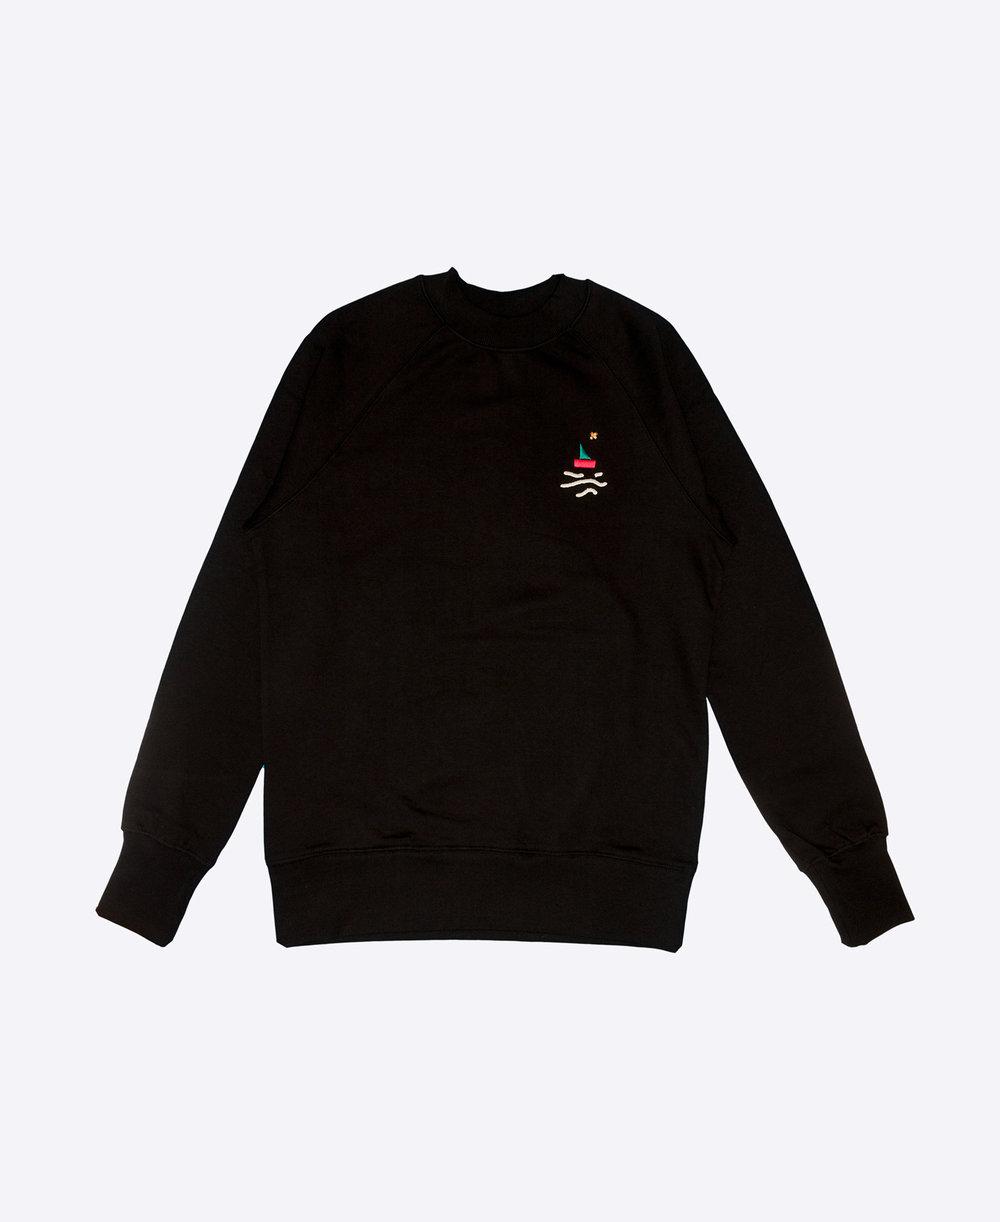 bootje-story-black-raglan-sweater.jpg